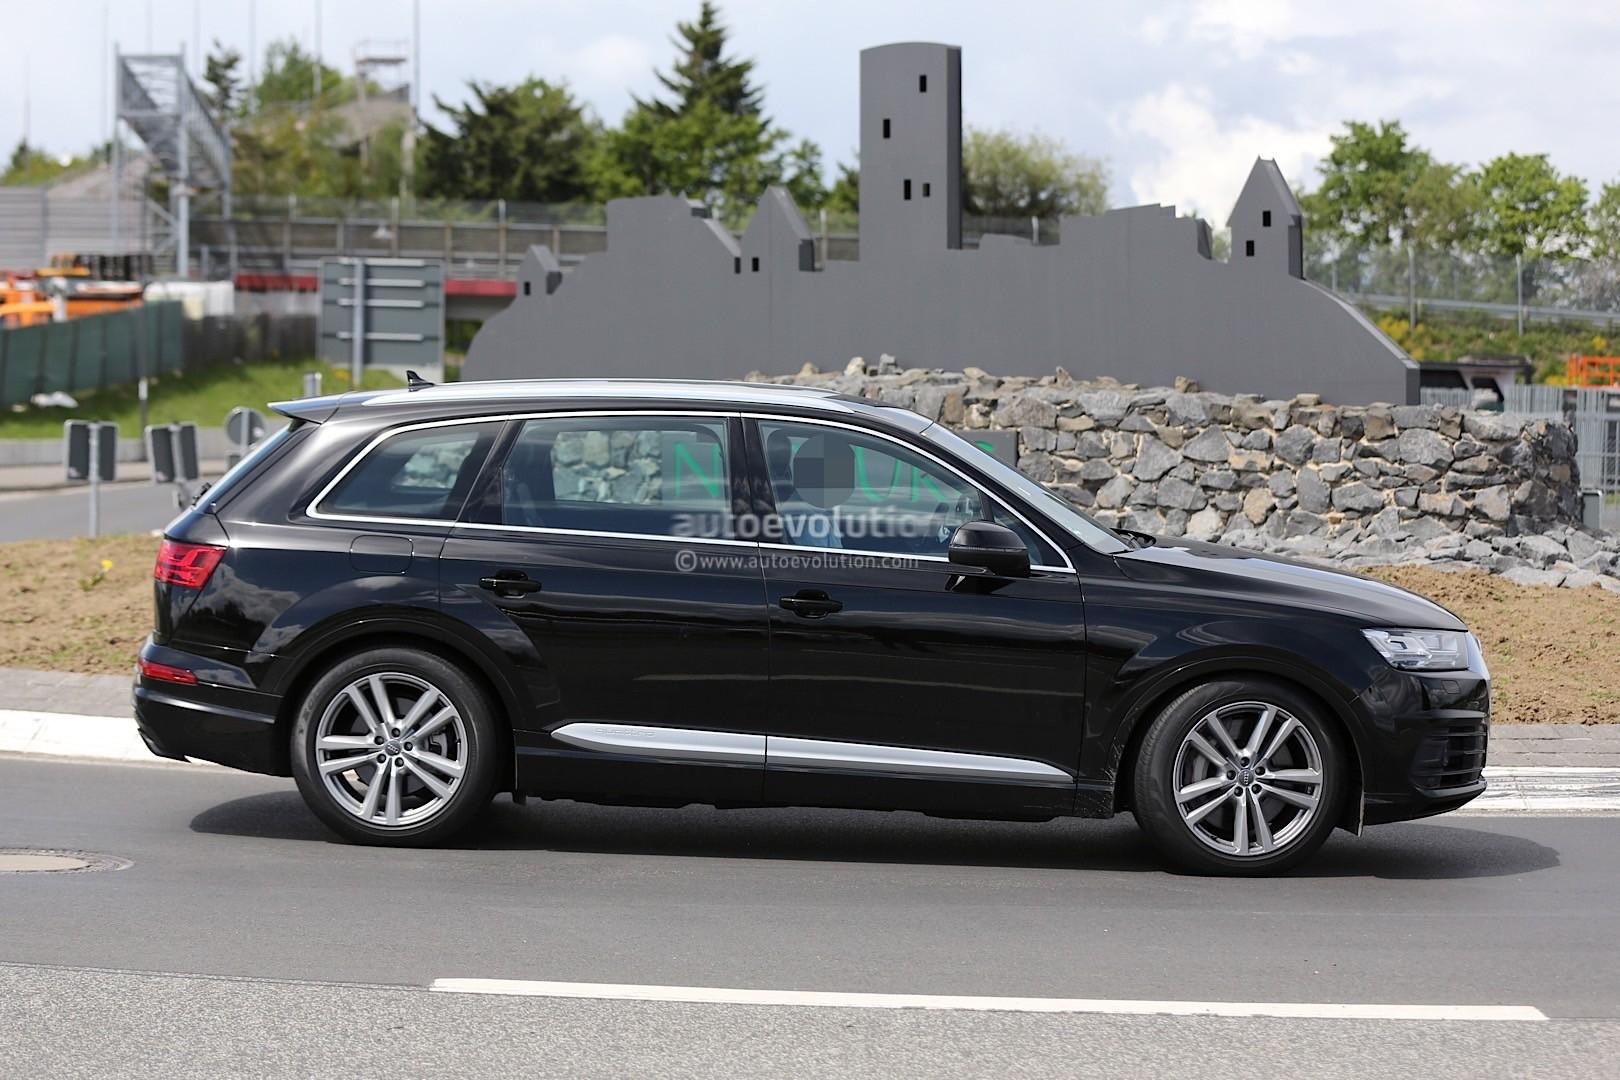 2016 Audi SQ7 Prototype Crashes at Nurburgring - autoevolution